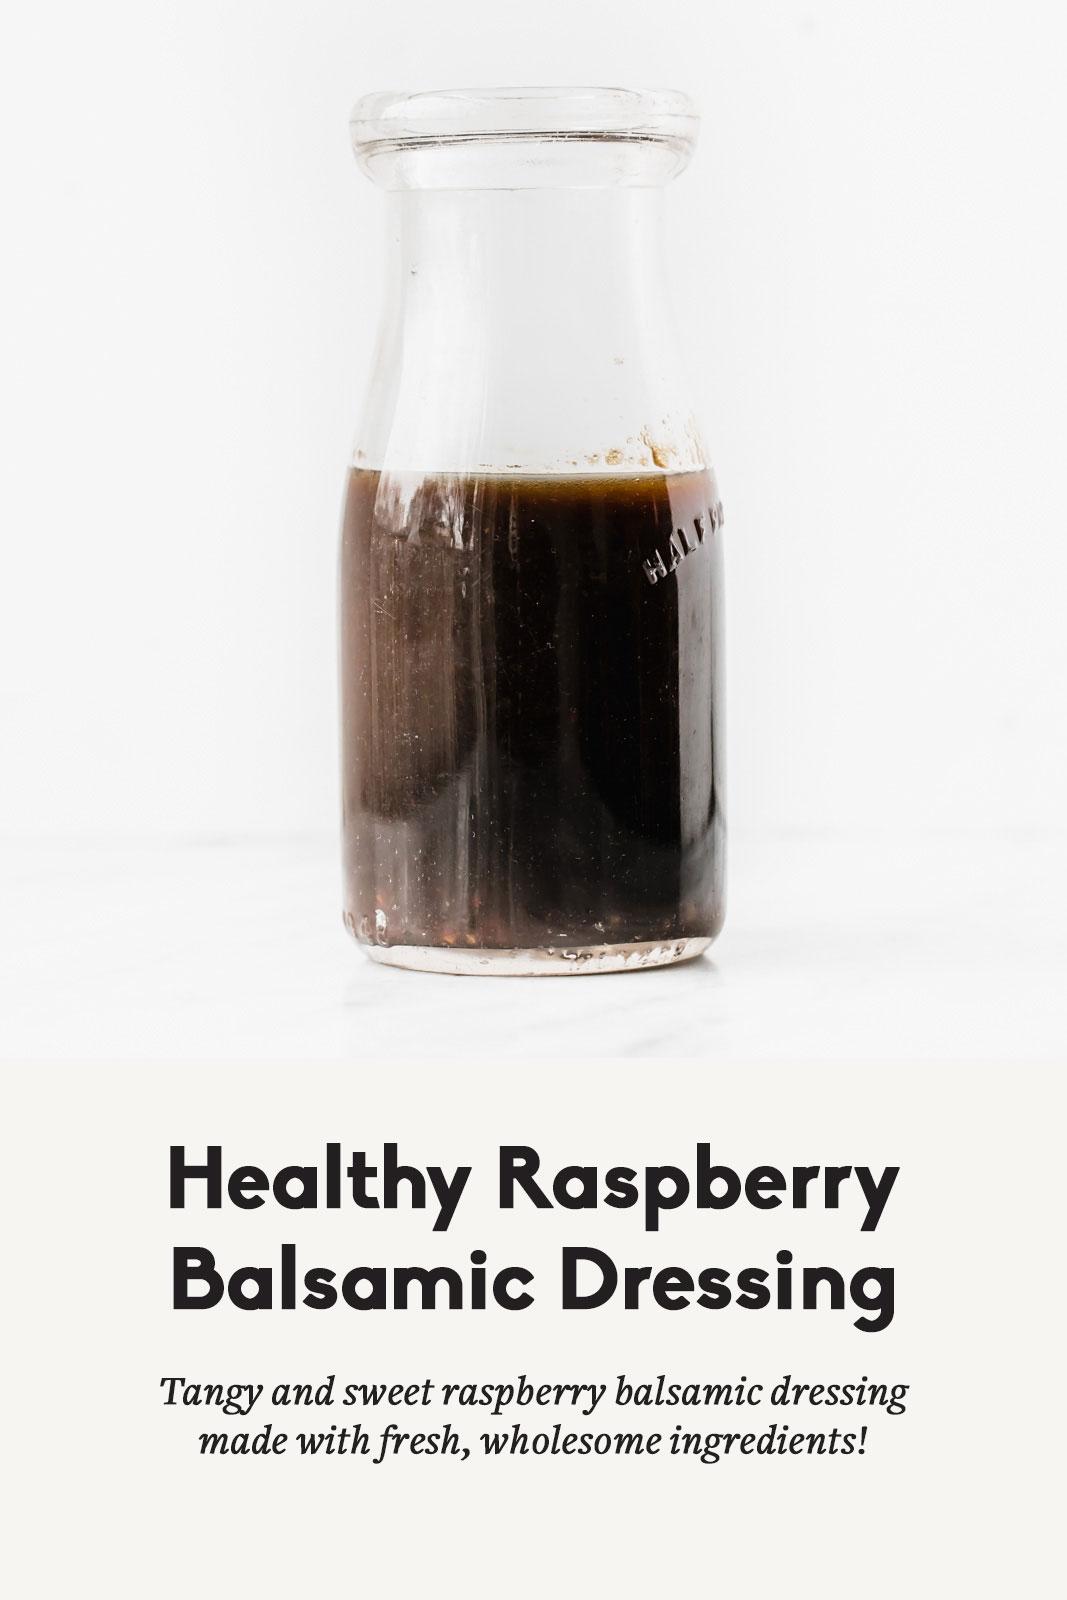 raspberry balsamic dressing in a bottle